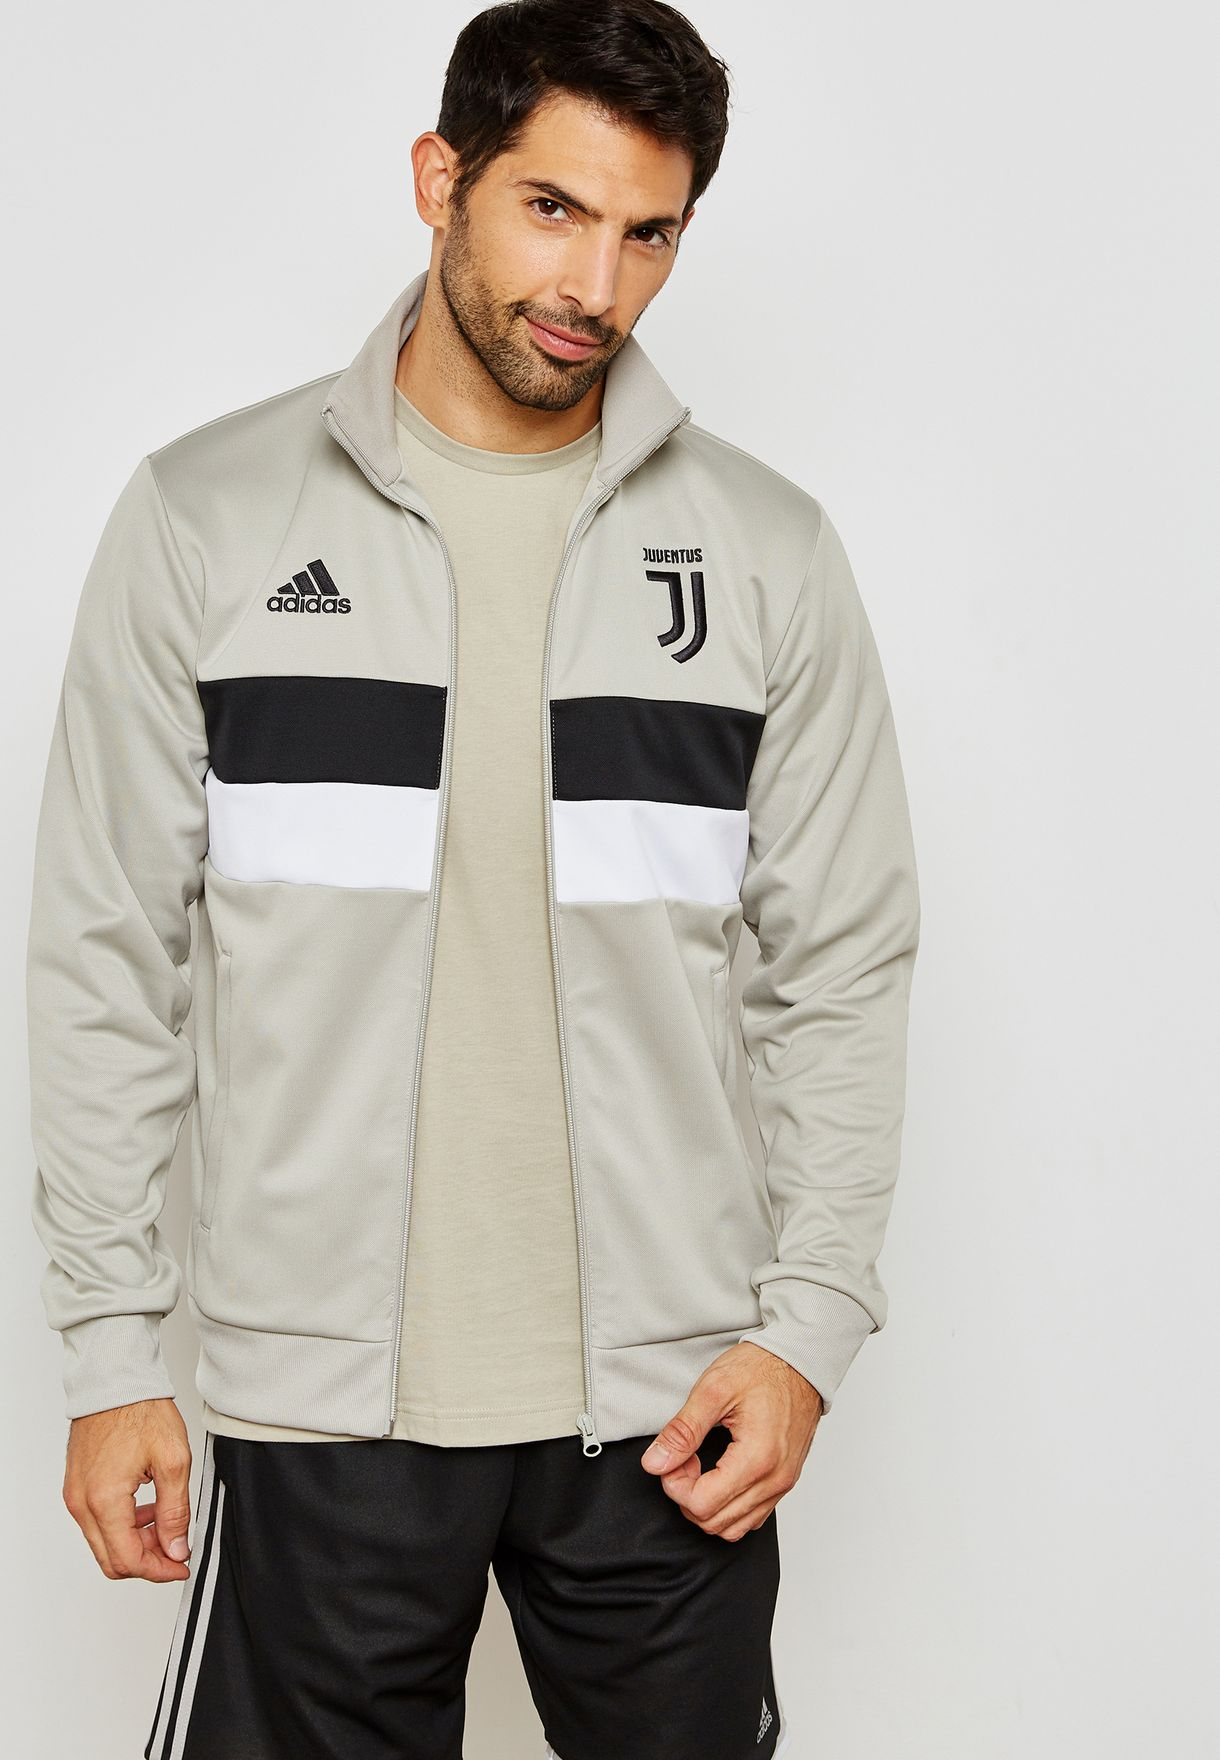 4e911b587 adidas FC Juventus 2018-19 3 Stripe Track Jacket - Soccer Shop Turin  Juventus Merchandise - Superfanas.lt